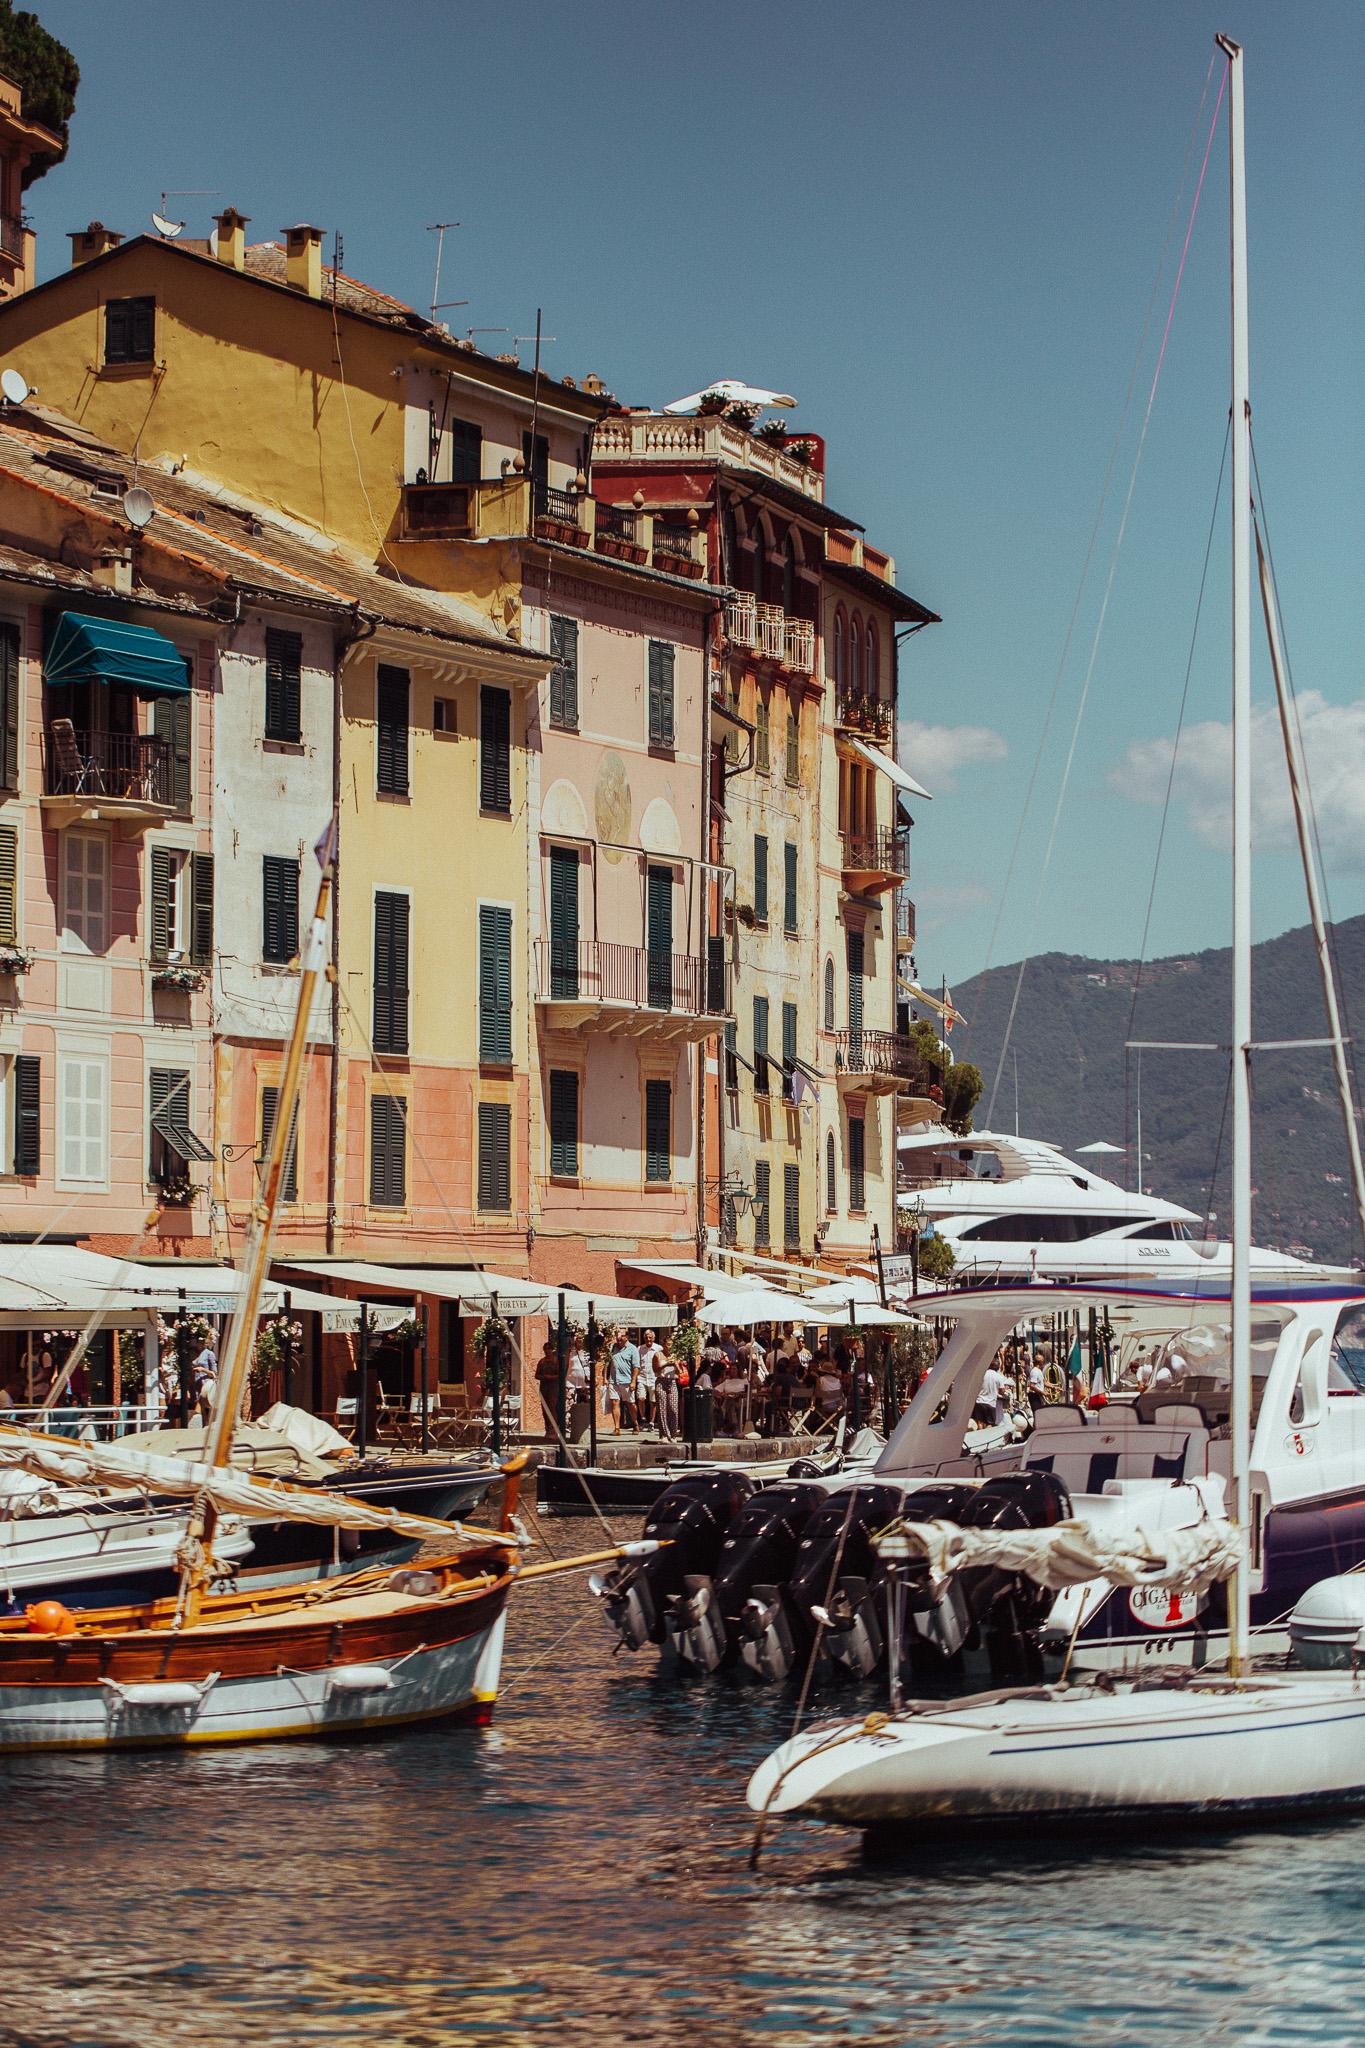 190807-Rapallo-3934.jpg